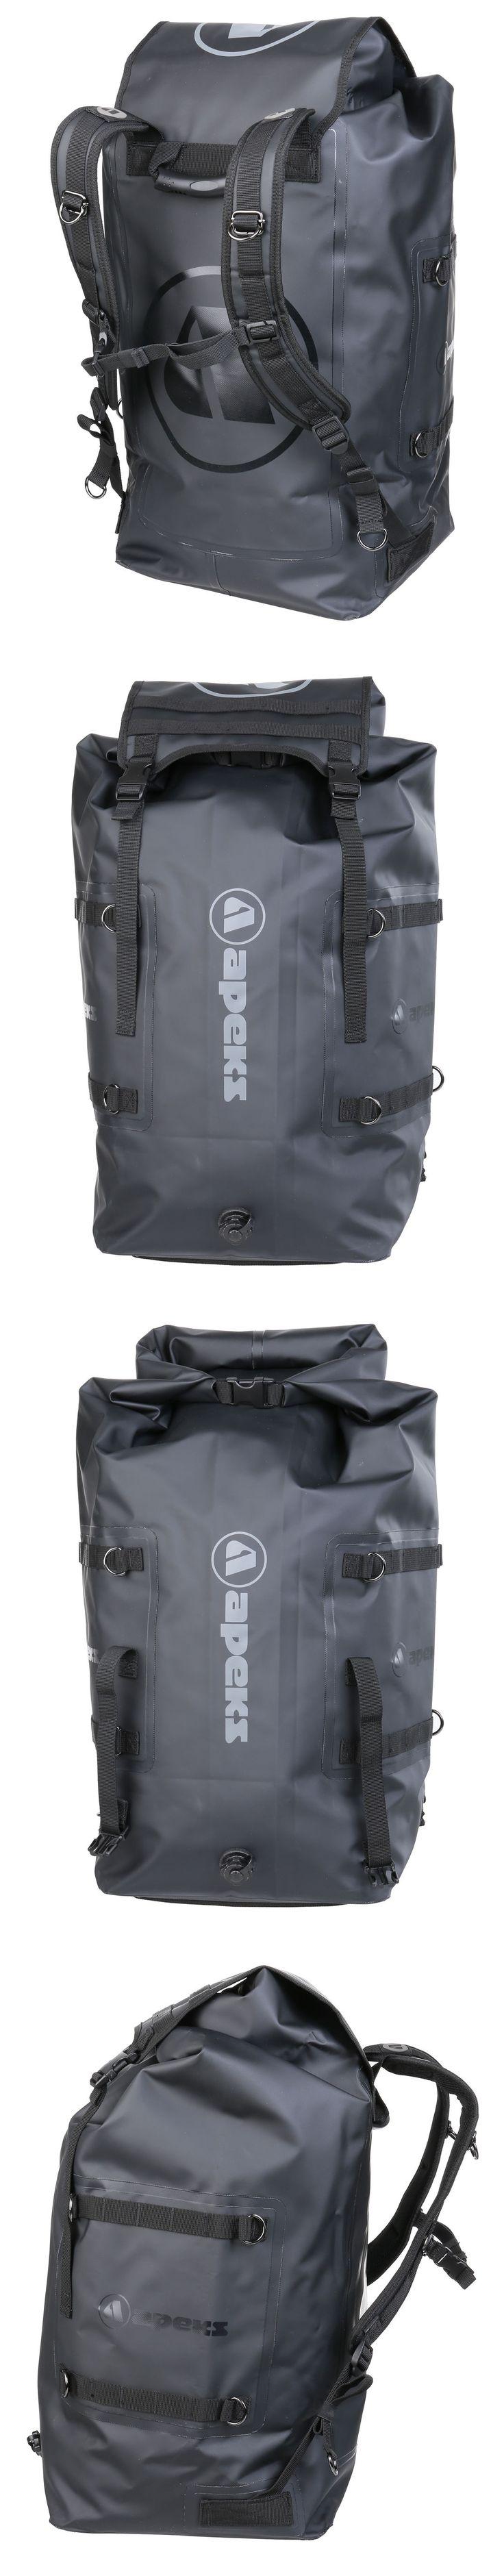 Gear Bags 29576: Apeks Dry 75 Twin Core Dry Bag Scuba Gear Backpack BUY IT NOW ONLY: $180.0